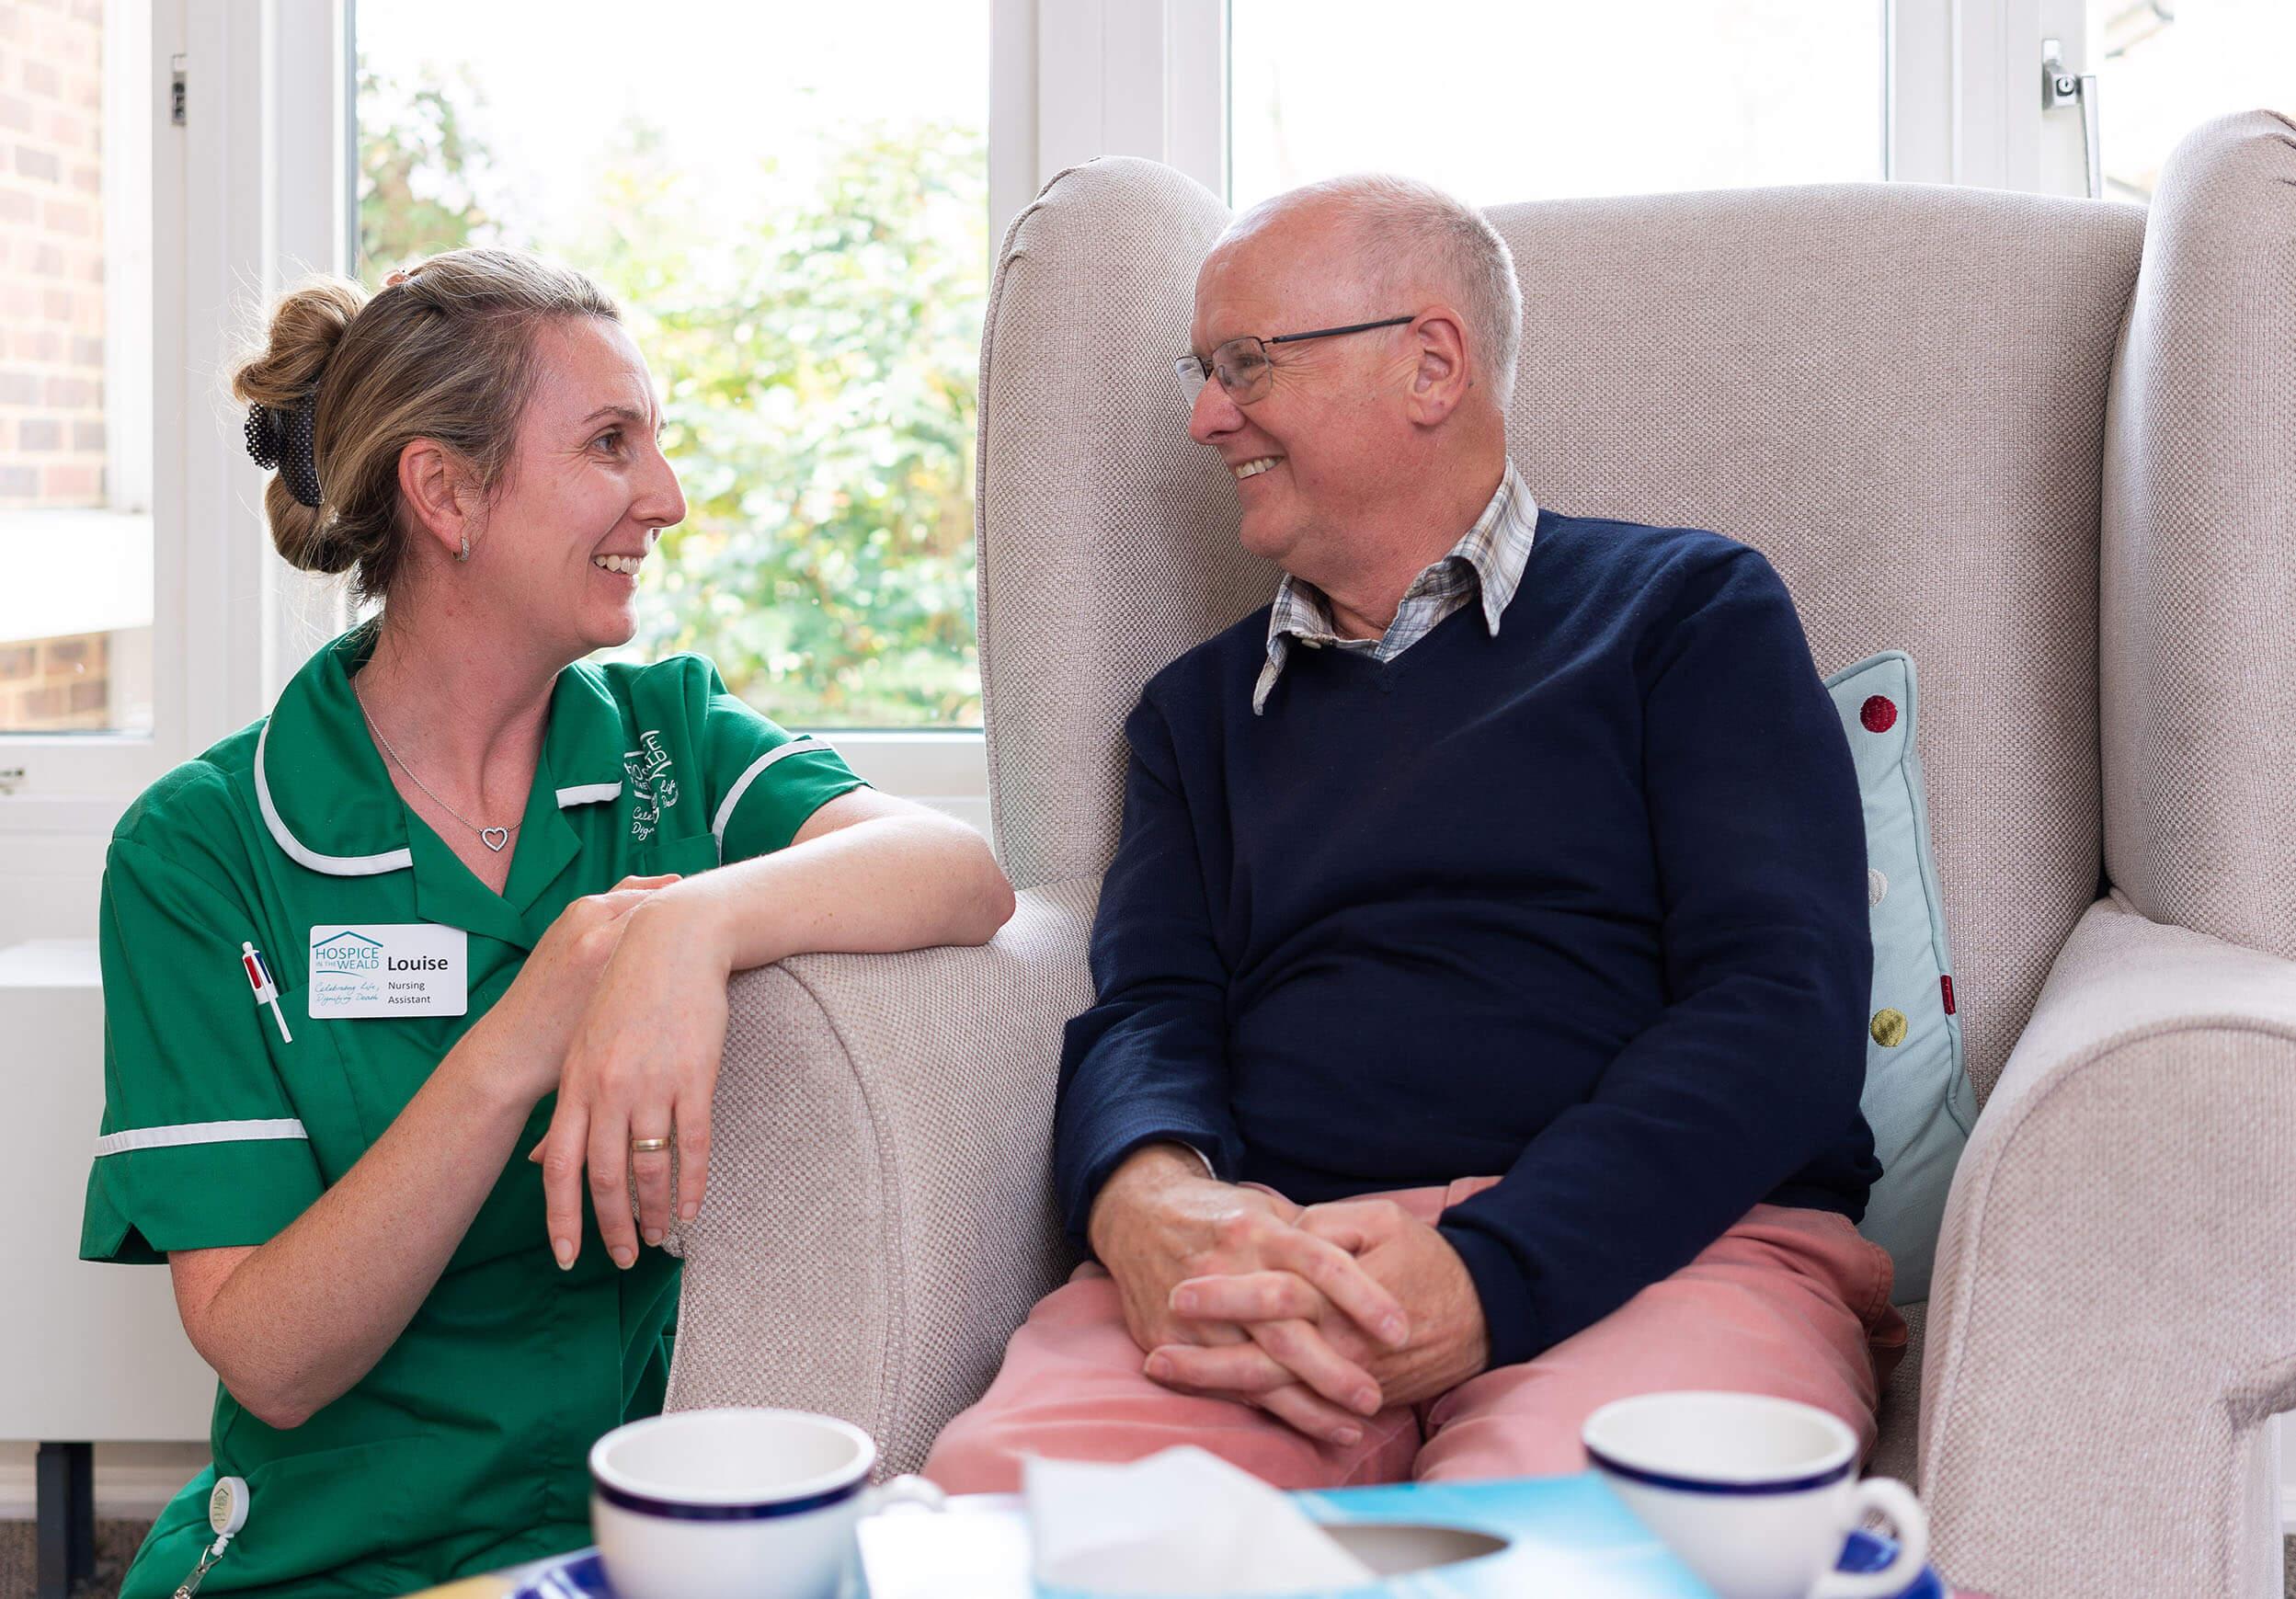 Male patient with hospice nurse